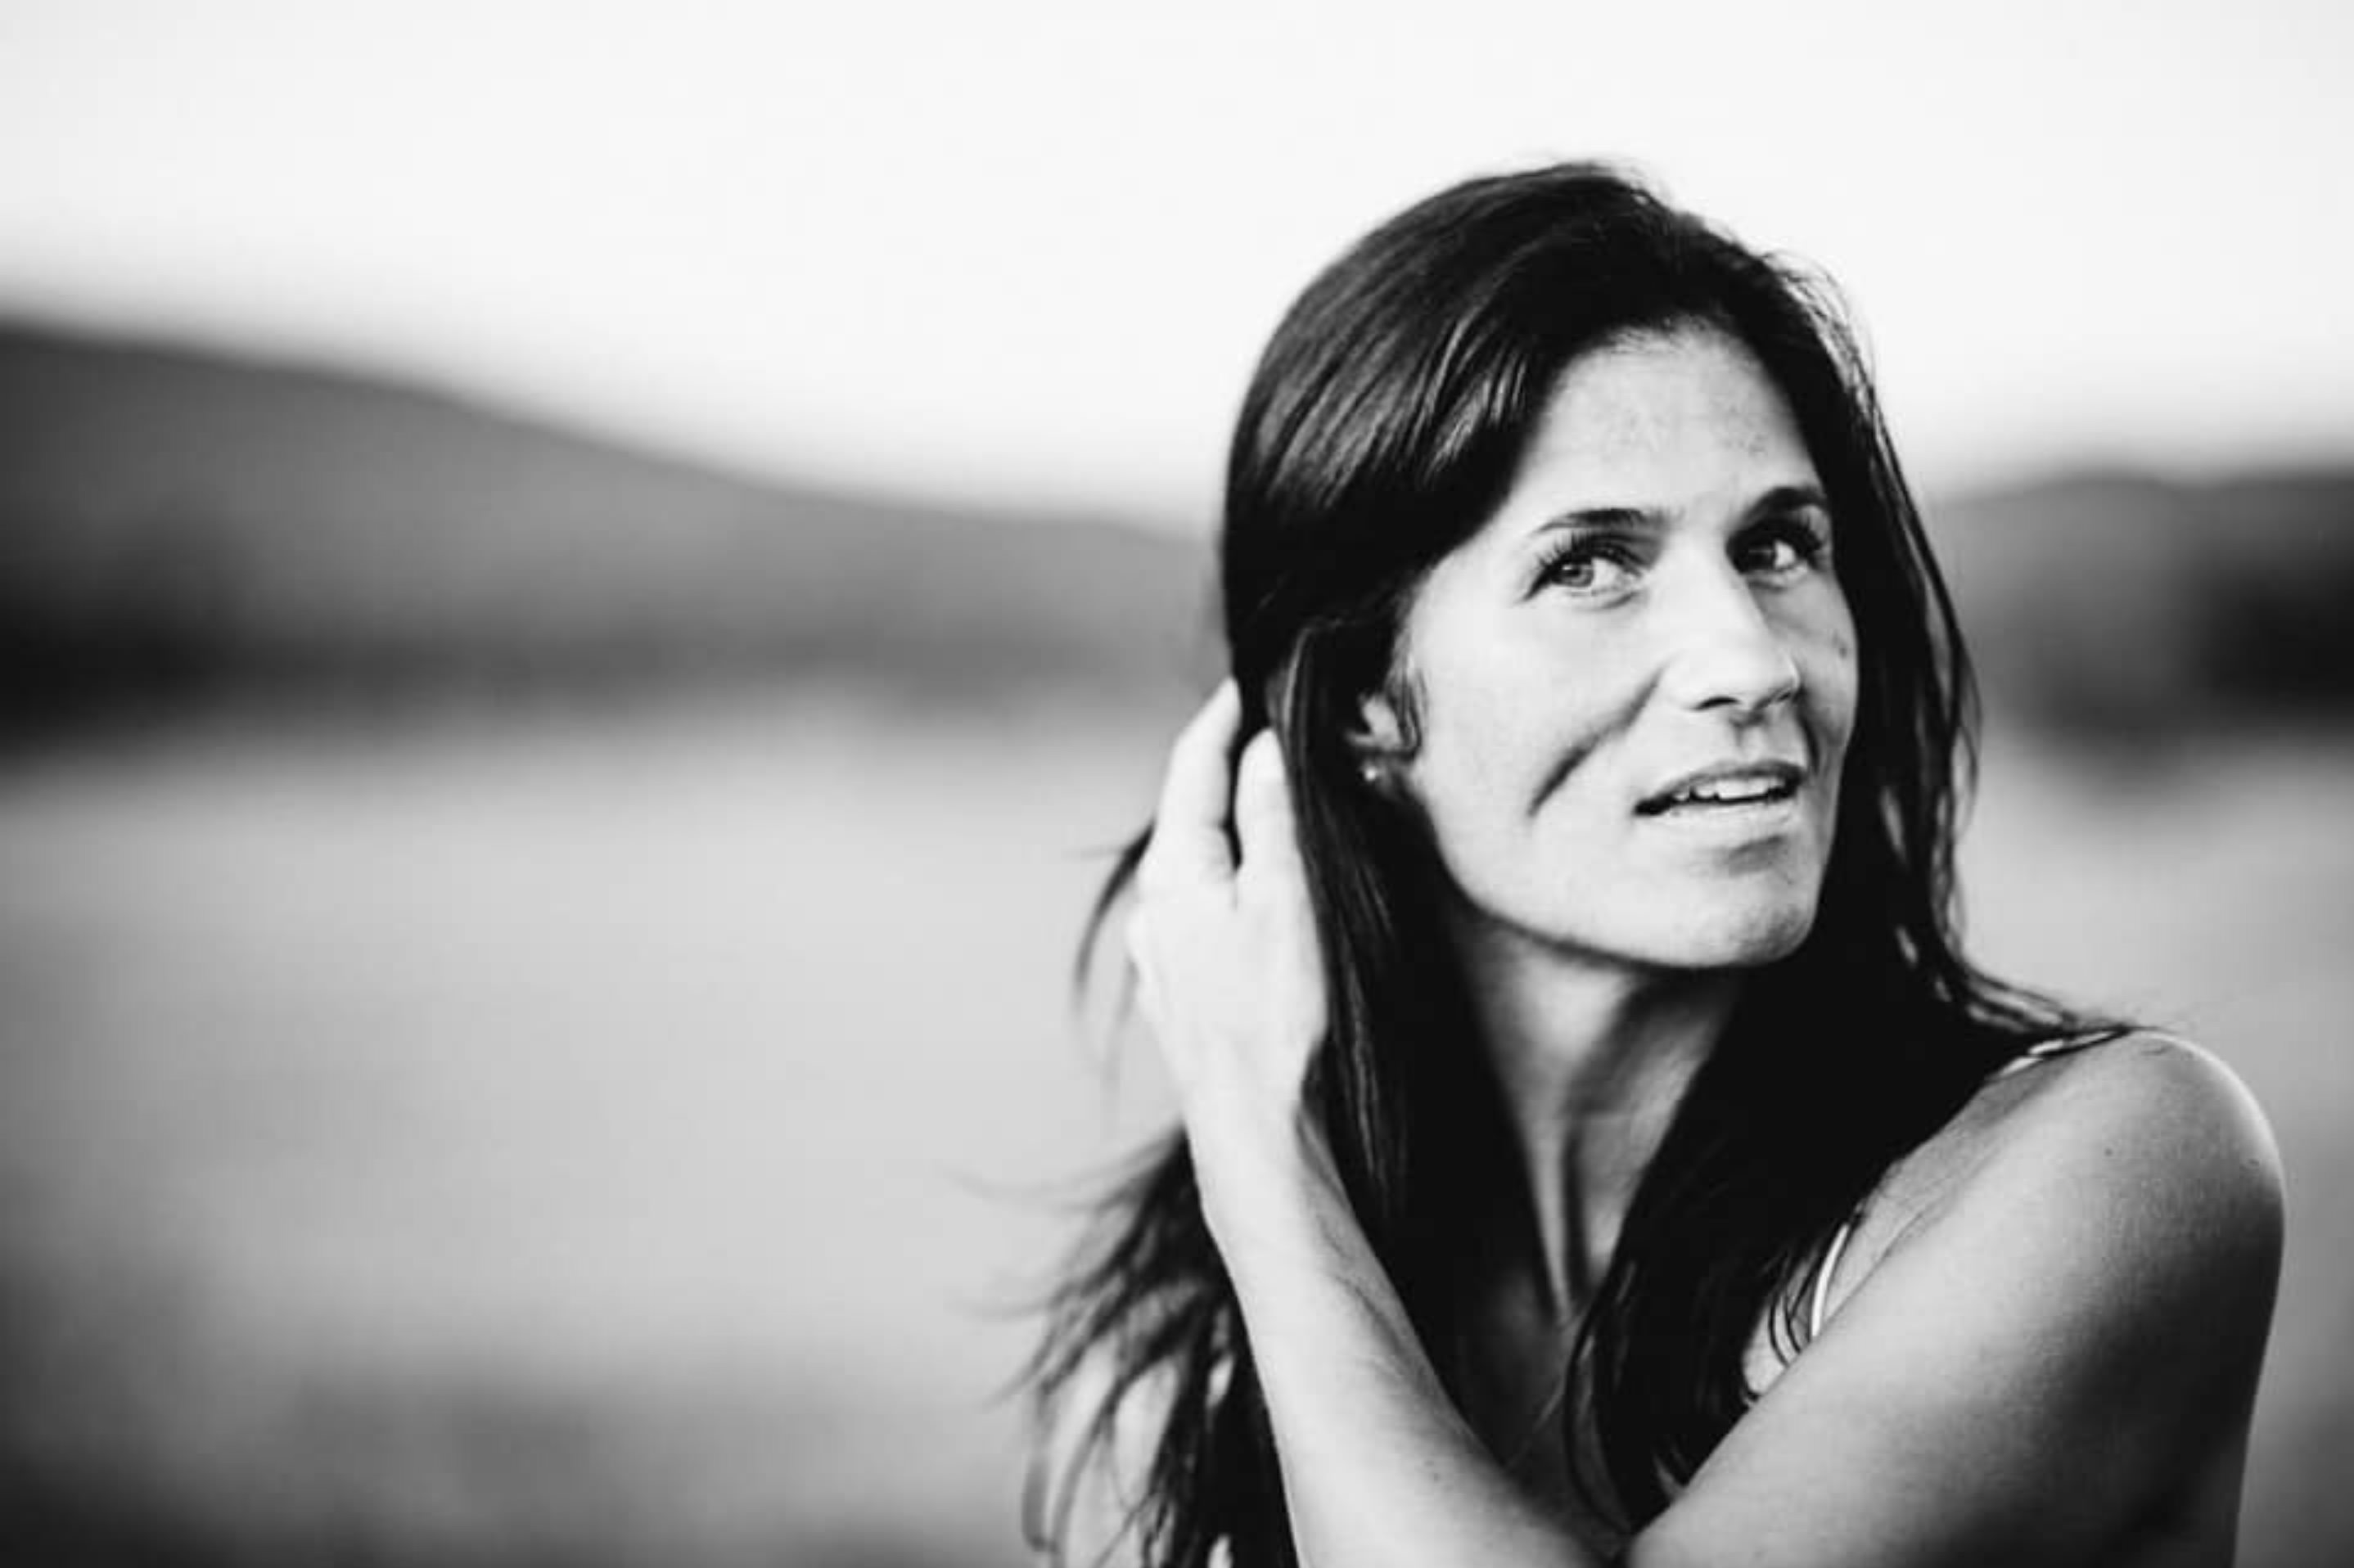 Julie-Marchand-2018-09-04_06h56